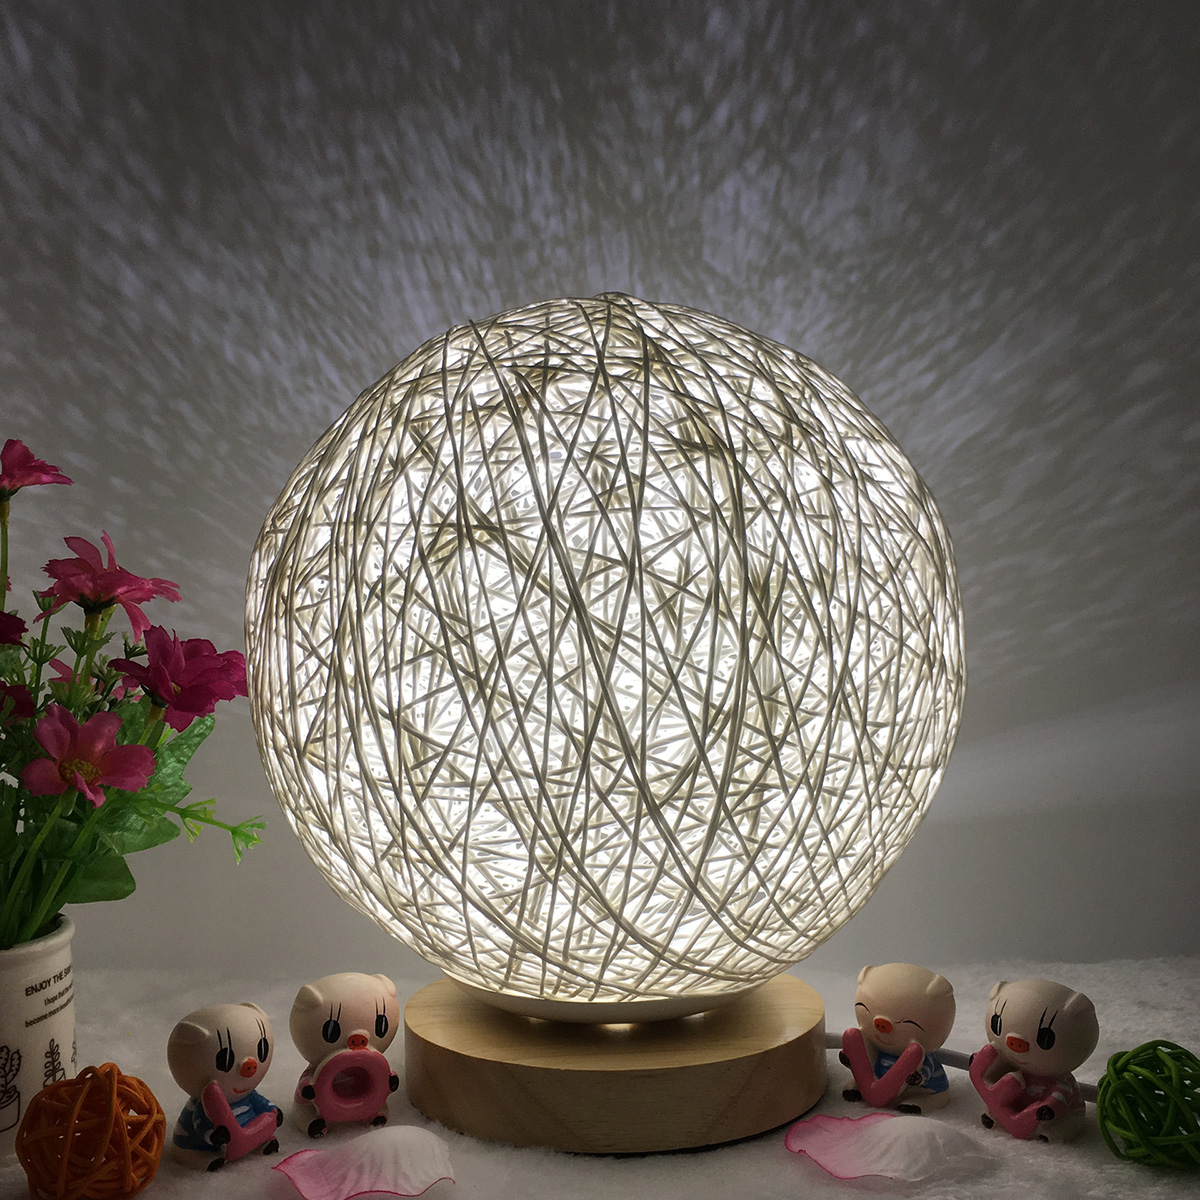 Creative שולחן מנורת יד לסרוג אהיל עץ ירח מנורת USB שינה בית חתונת קישוט אור ירח לילה אור